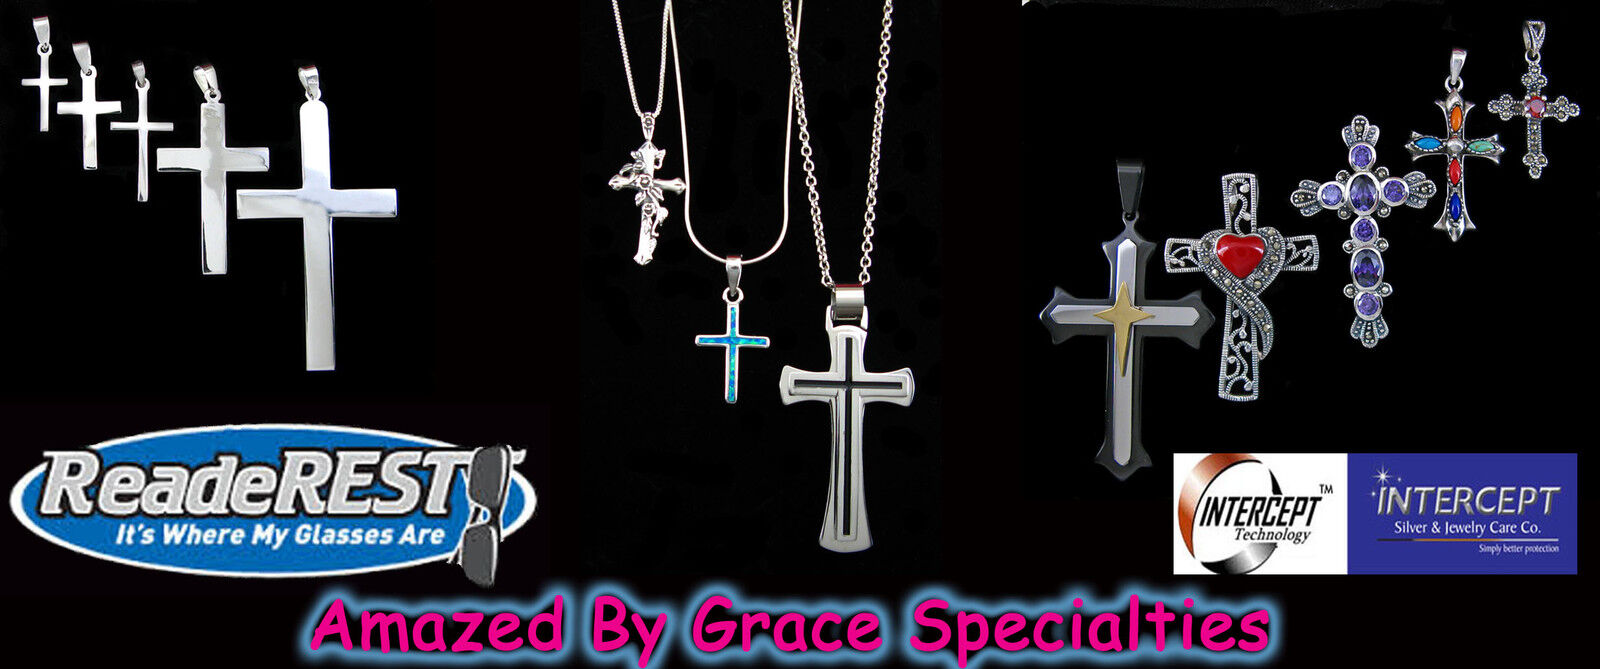 Amazed By Grace Specialties